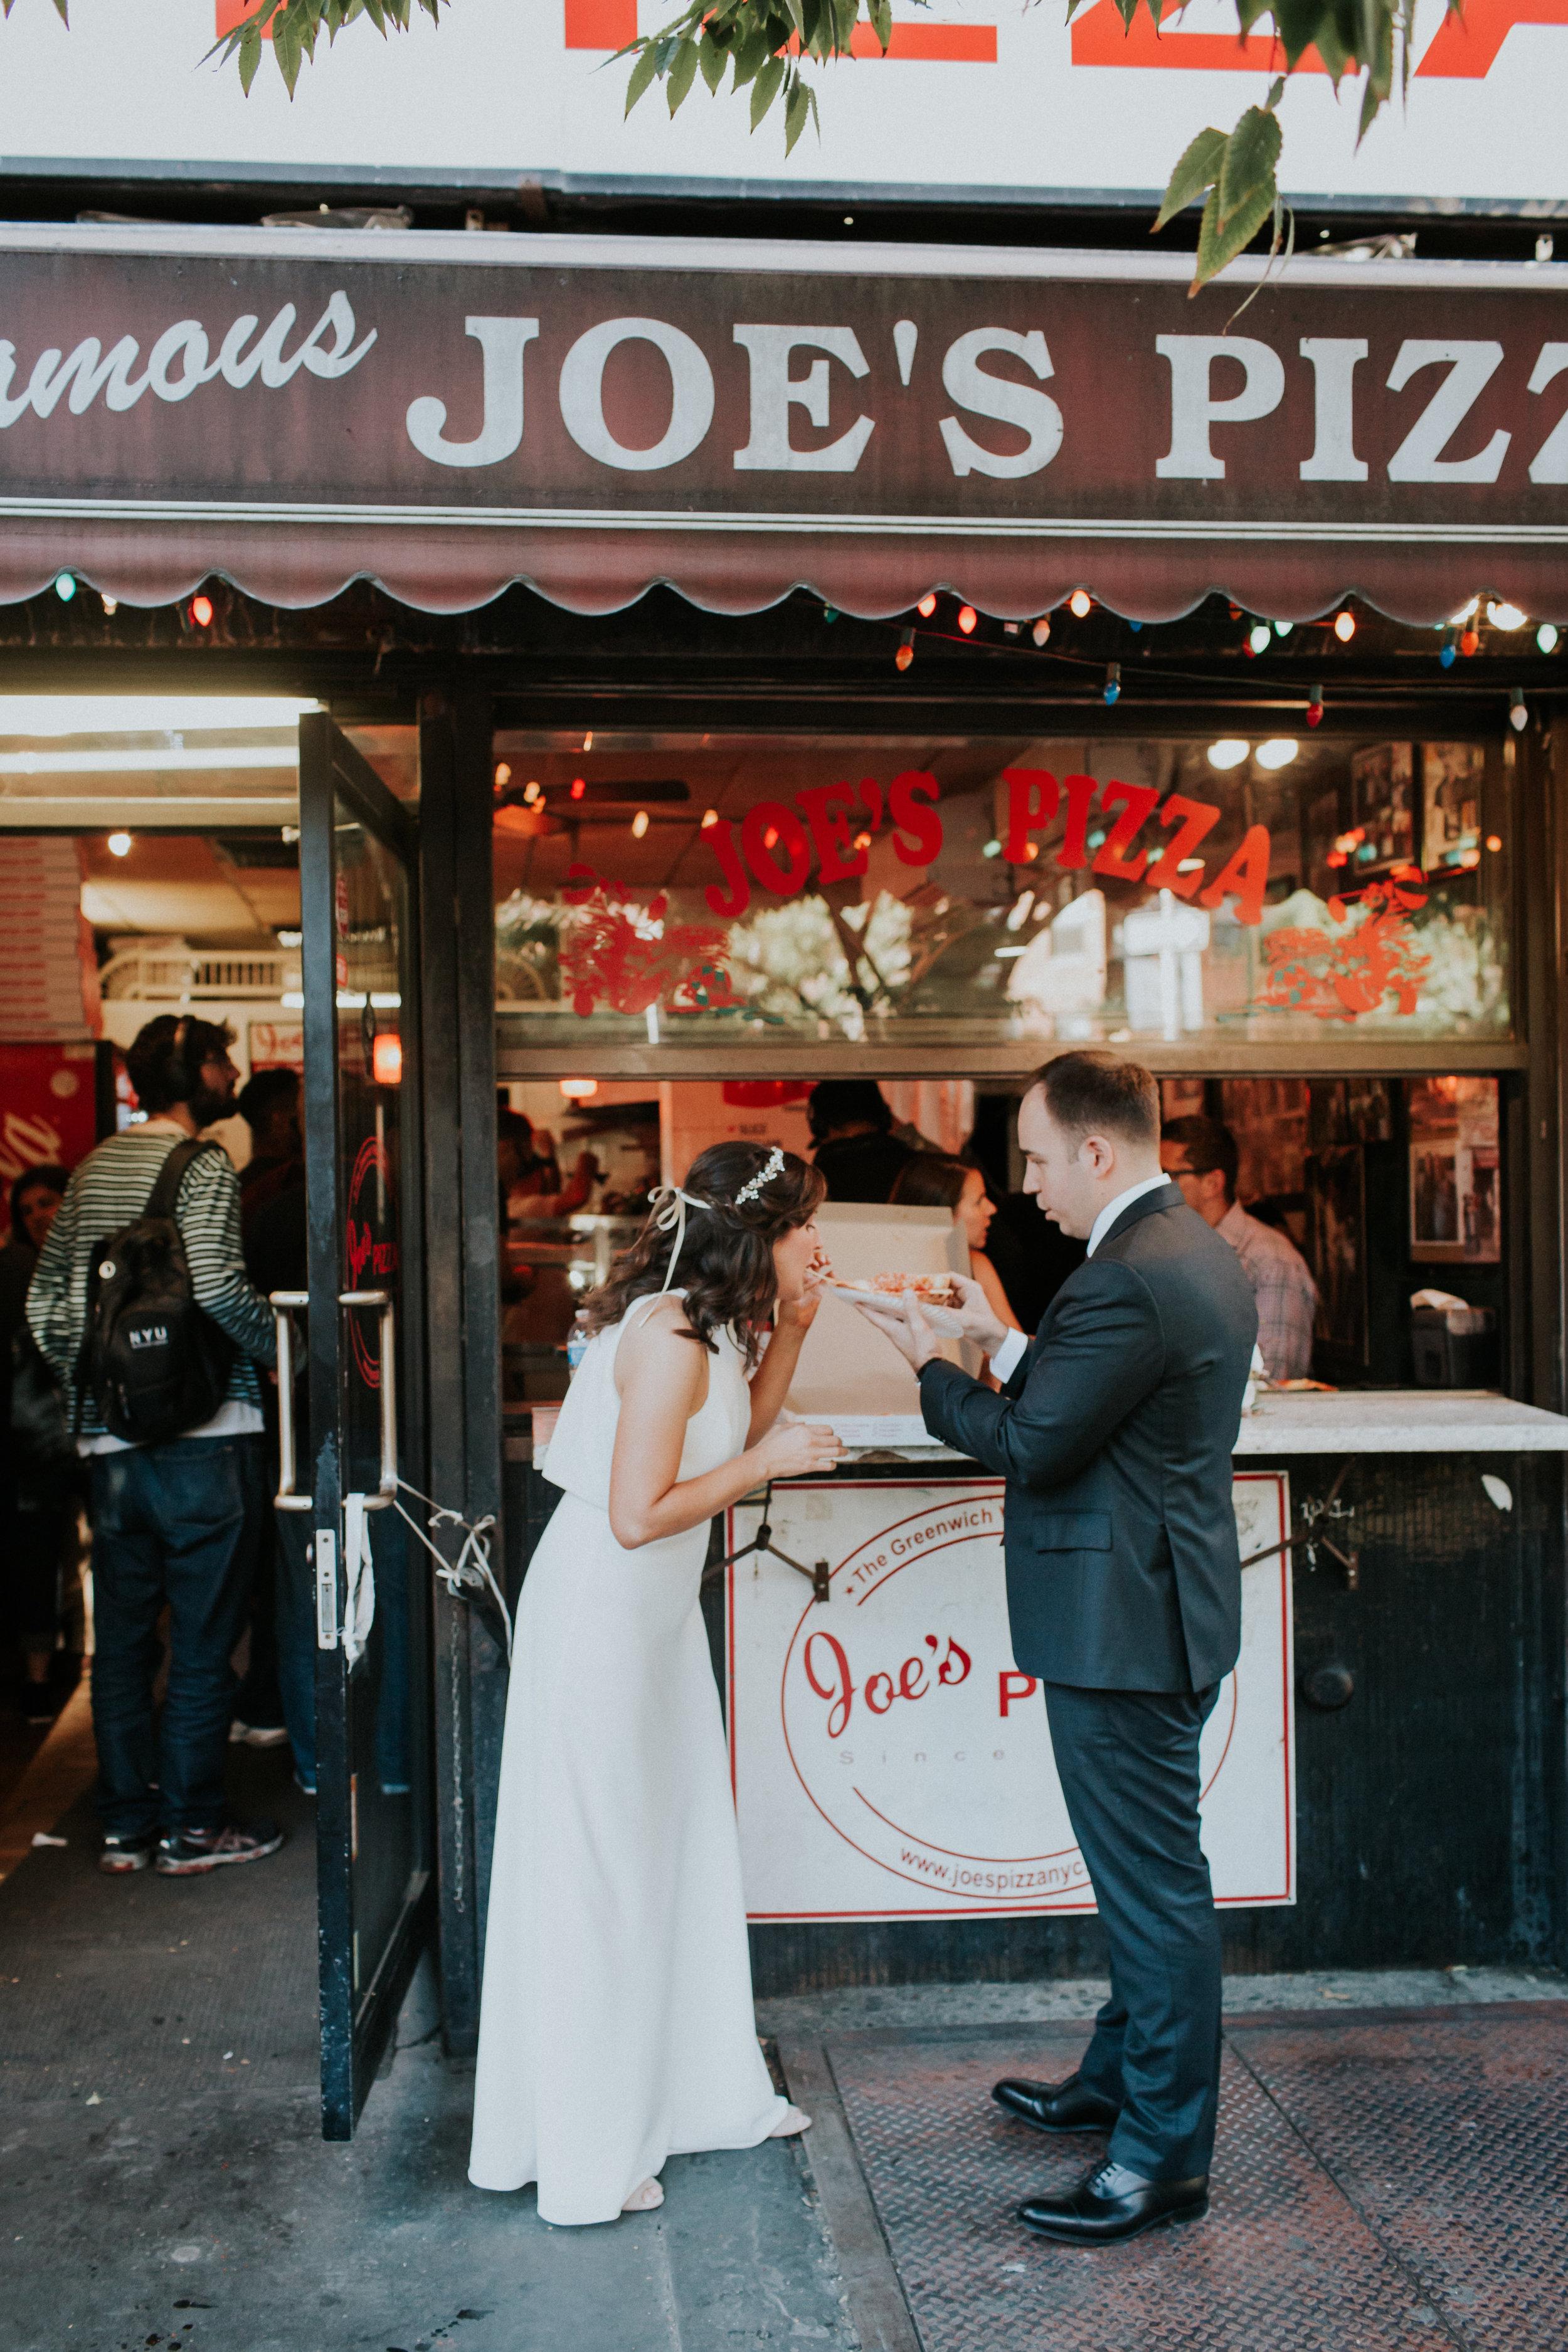 New-York-Documentary-Wedding-Photography-Best-Of-2017-by-Elvira-Kalviste-Photography-113.jpg